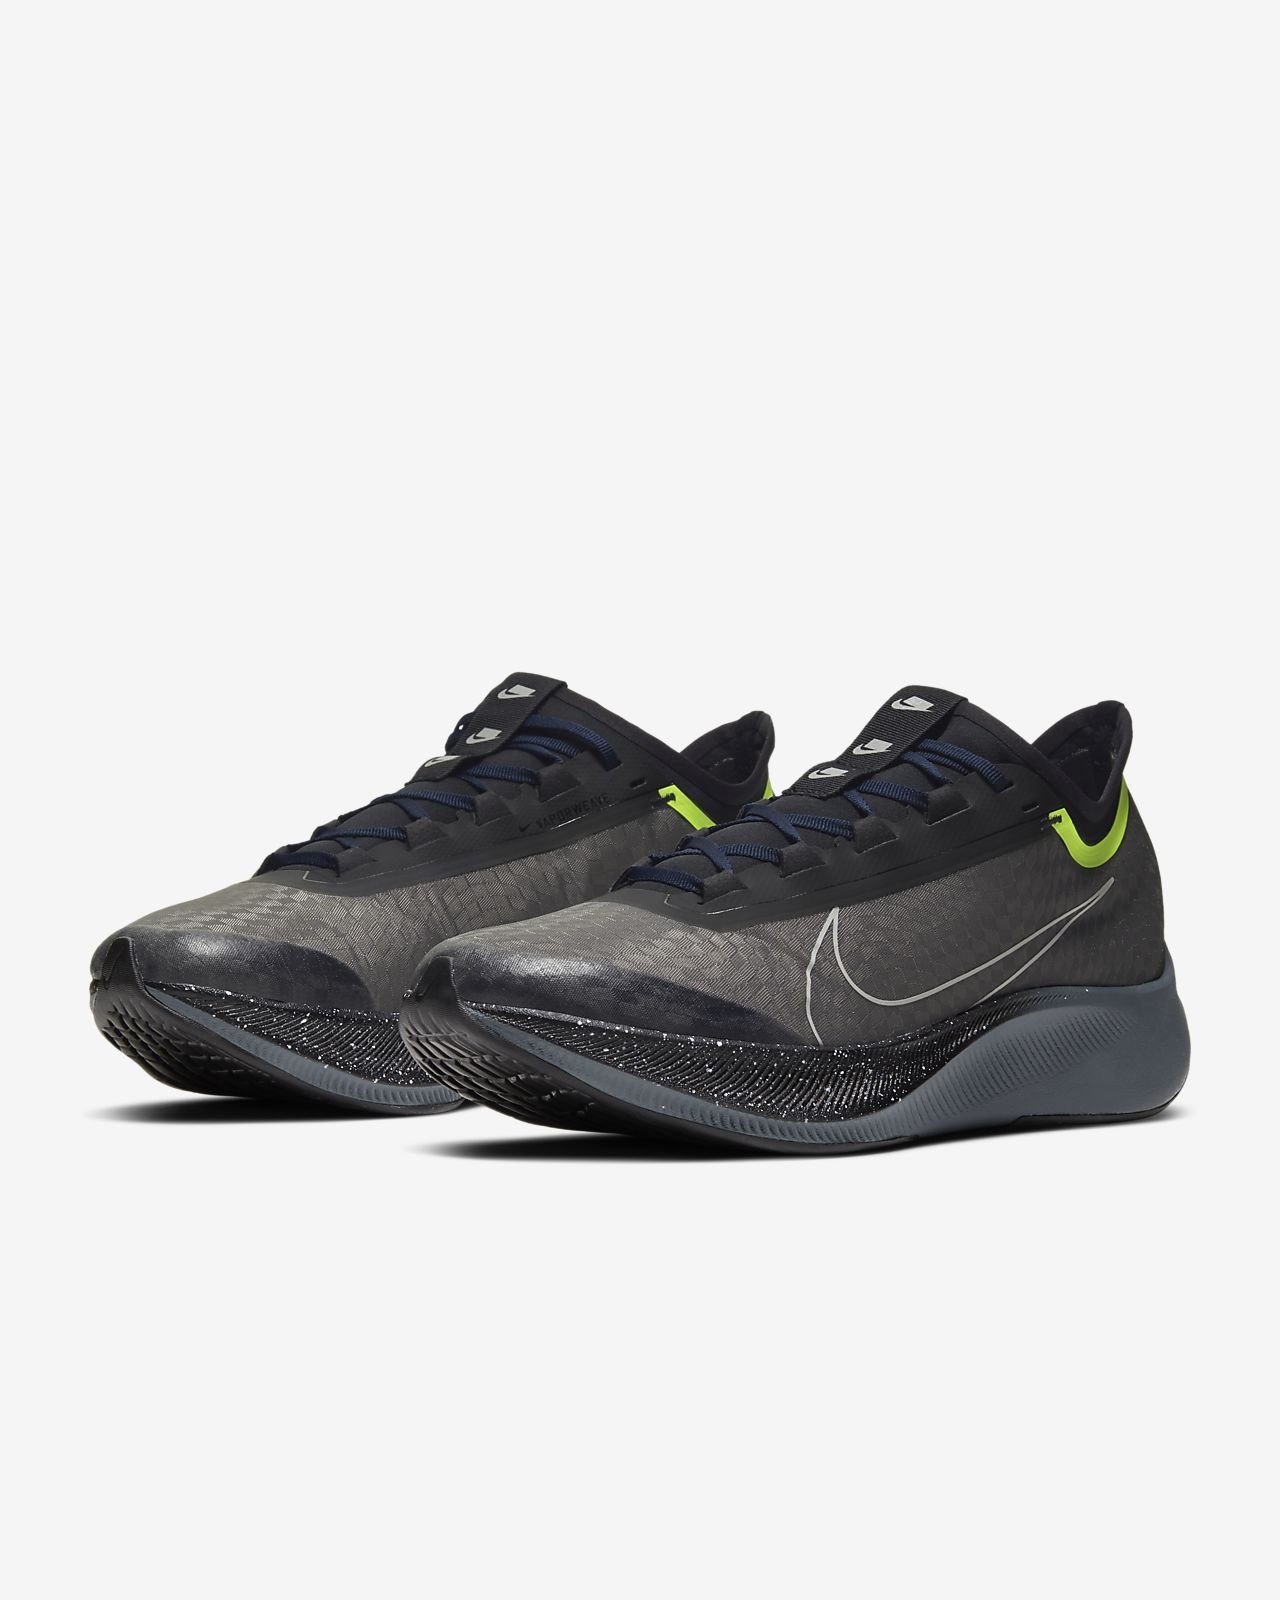 Nike Zoom Fly 3 Premium Scarpe da Running Uomo Black